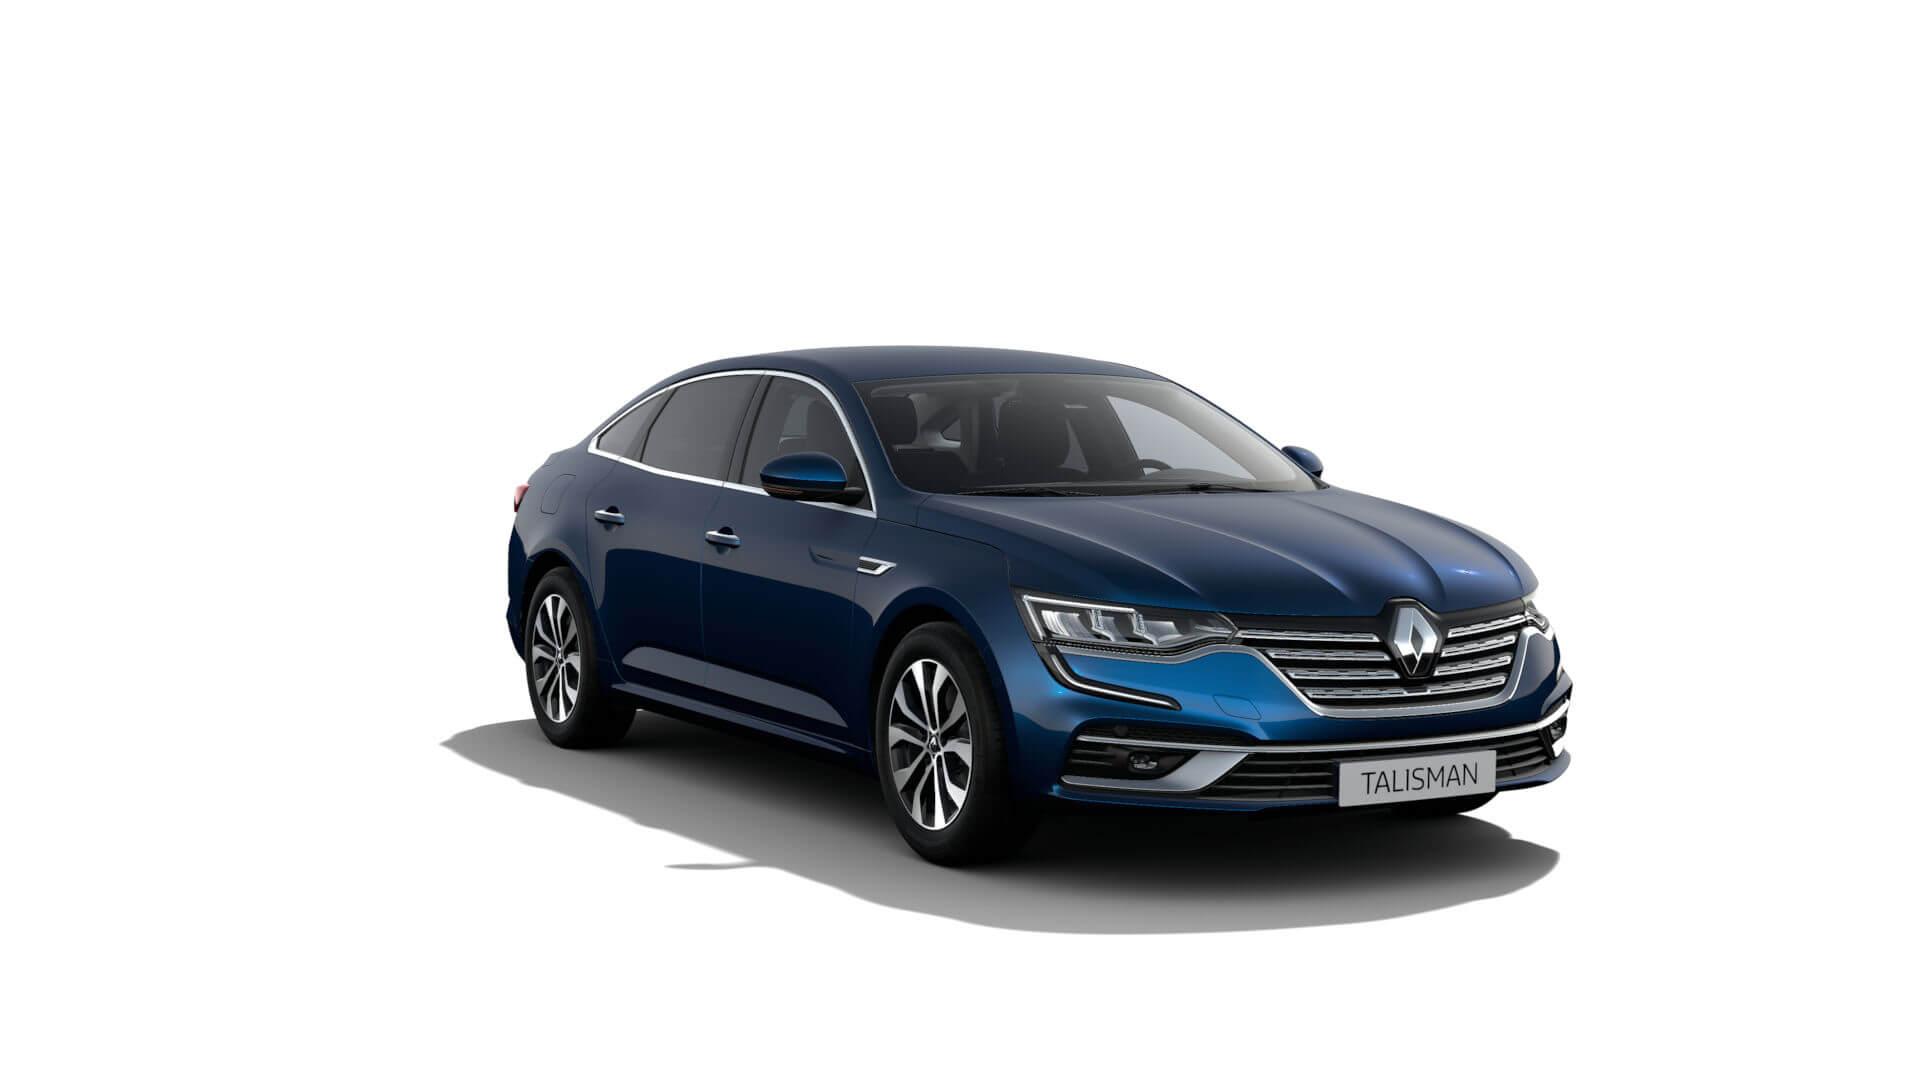 Automodell blau - Renault Talisman - Renault Ahrens Hannover